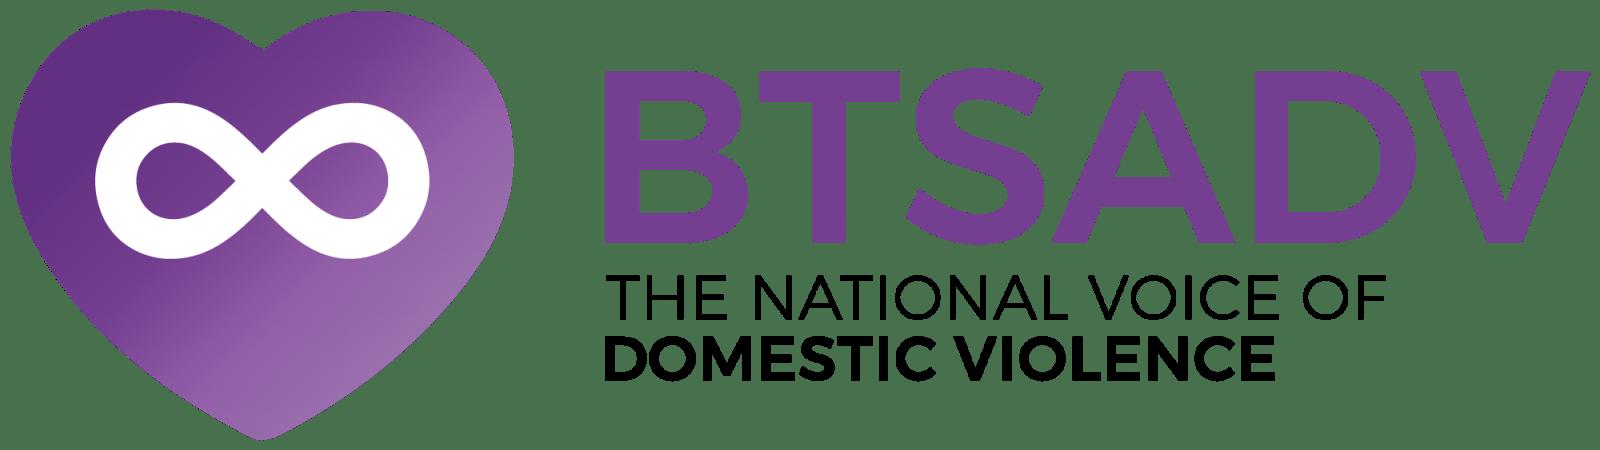 BTSADV ANNOUNCES 2020 ANGEL SCHOLARSHIP APPLICATION DATES